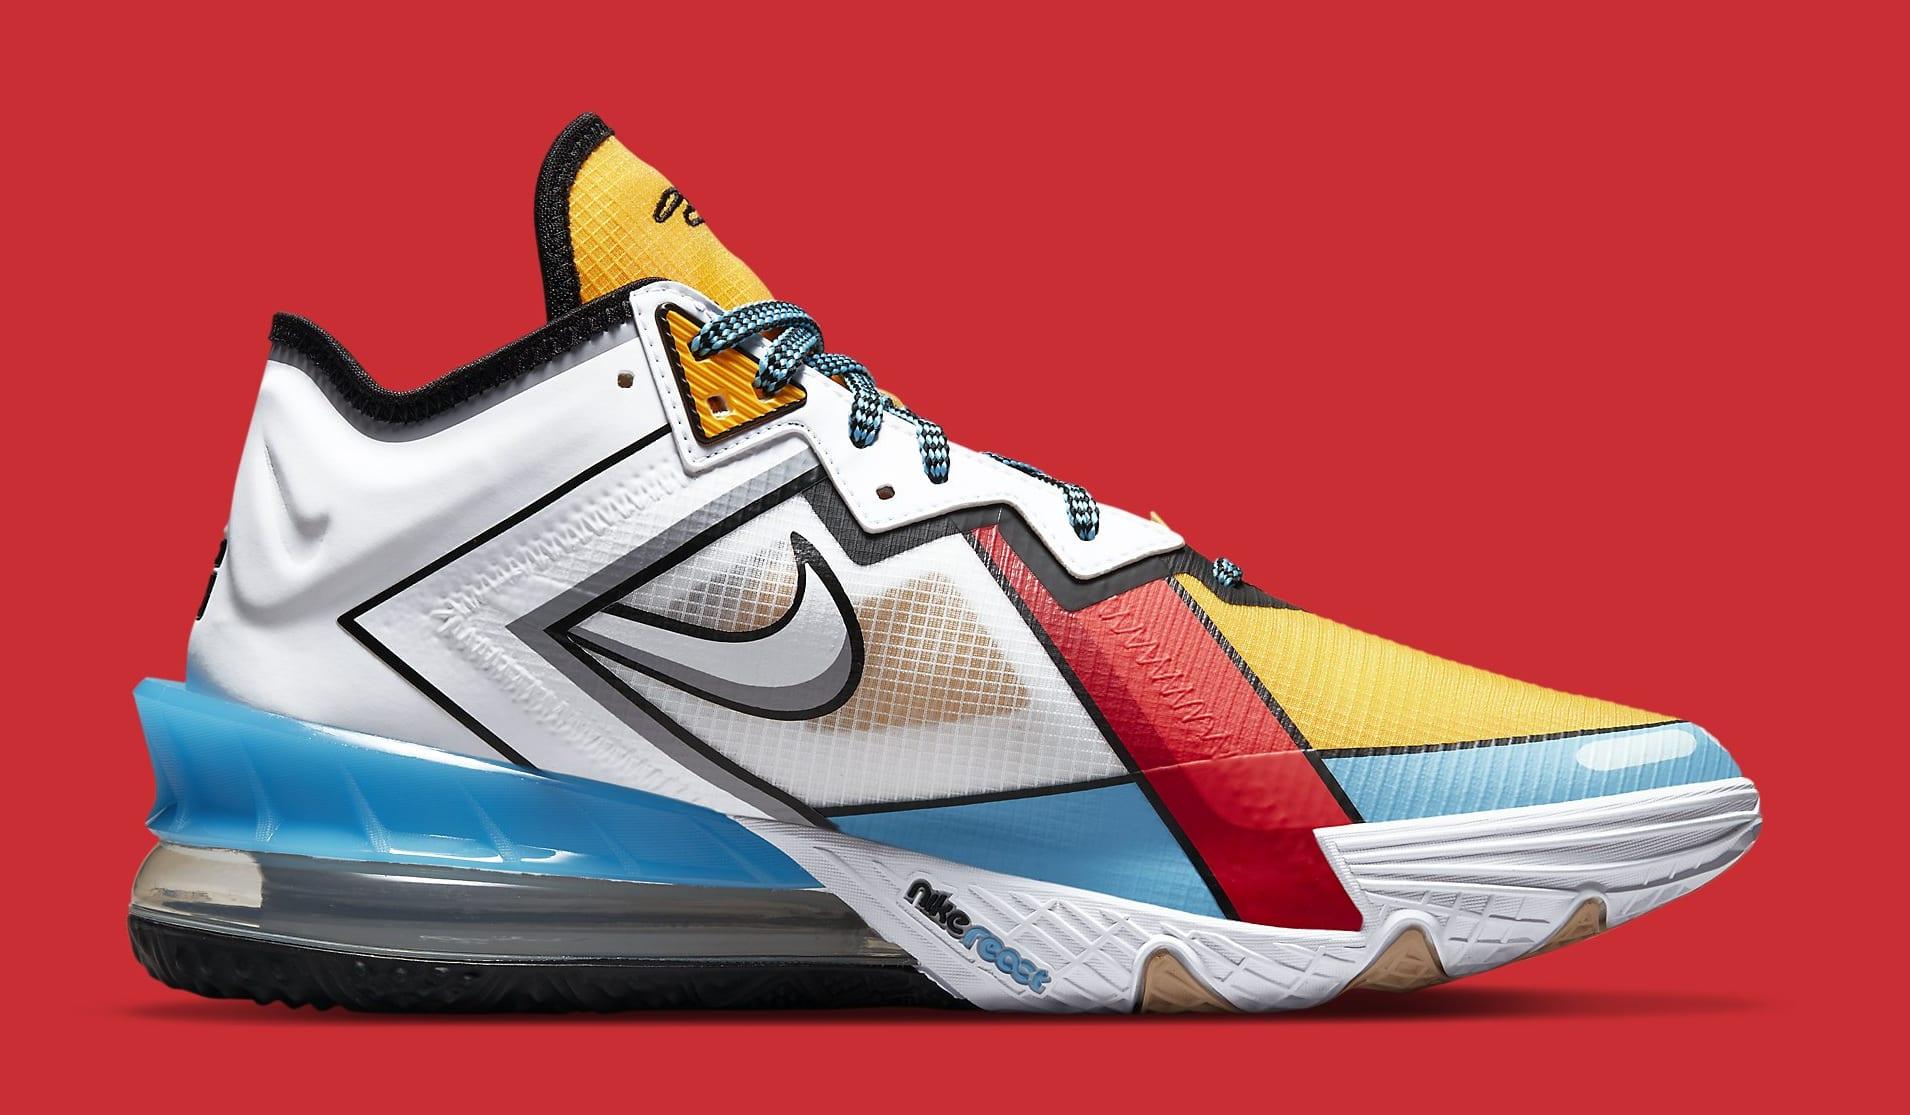 Nike LeBron 18 Low 'Stewie Griffin' CV7564-104 Medial